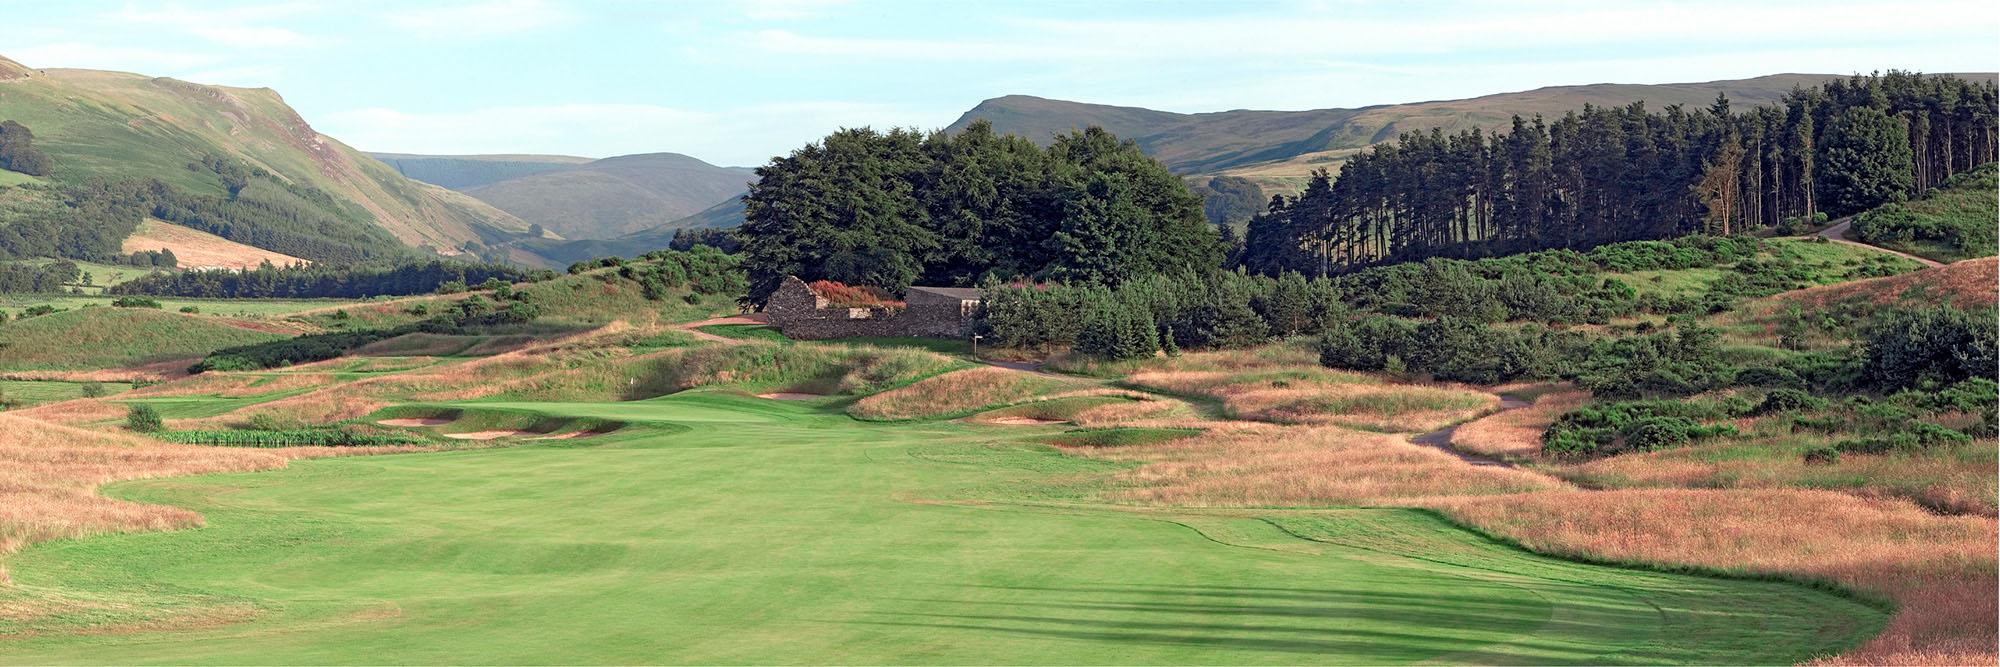 Golf Course Image - Gleneagles PGA Centenary Course No. 2